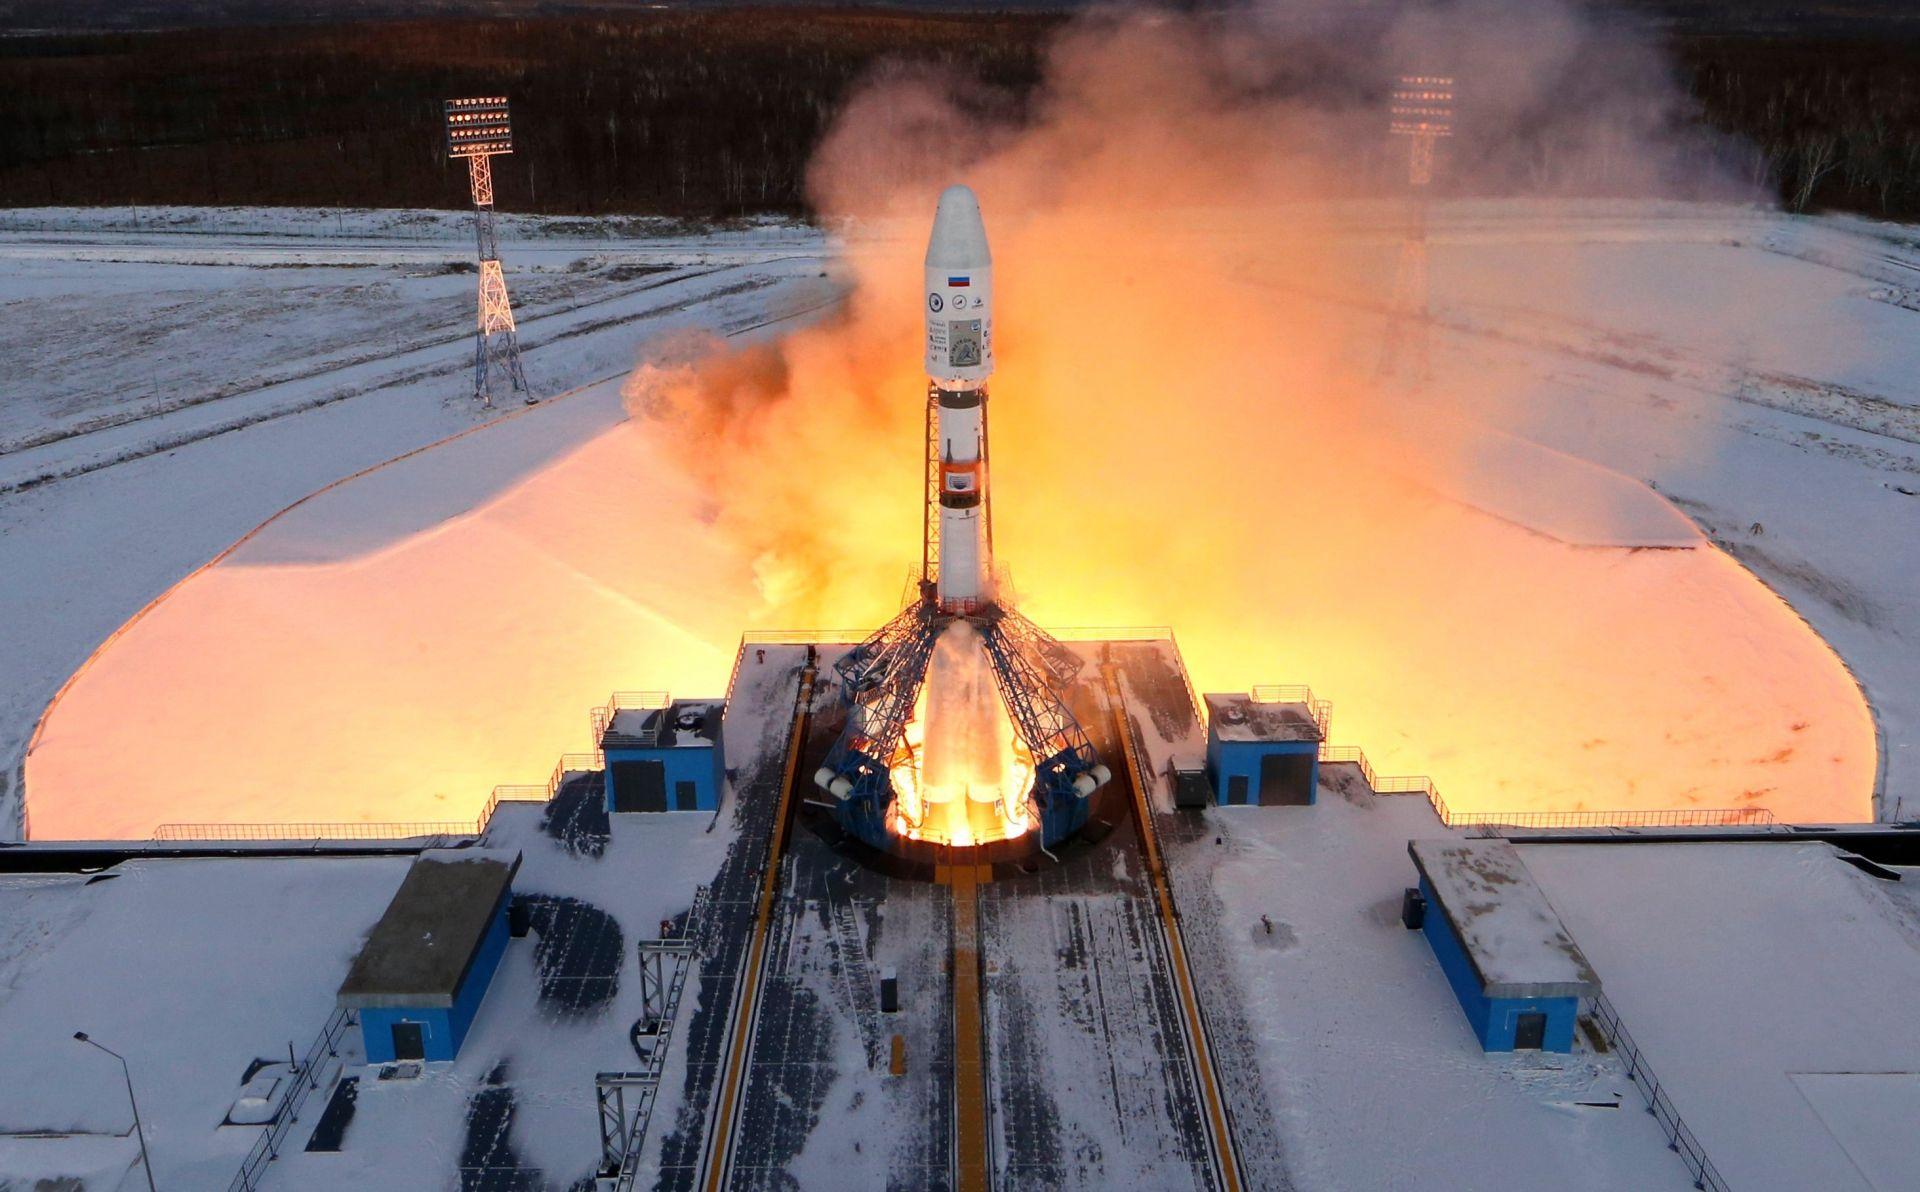 Rusia lanza con éxito un cohete desde su nuevo cosmódromo Vostochni